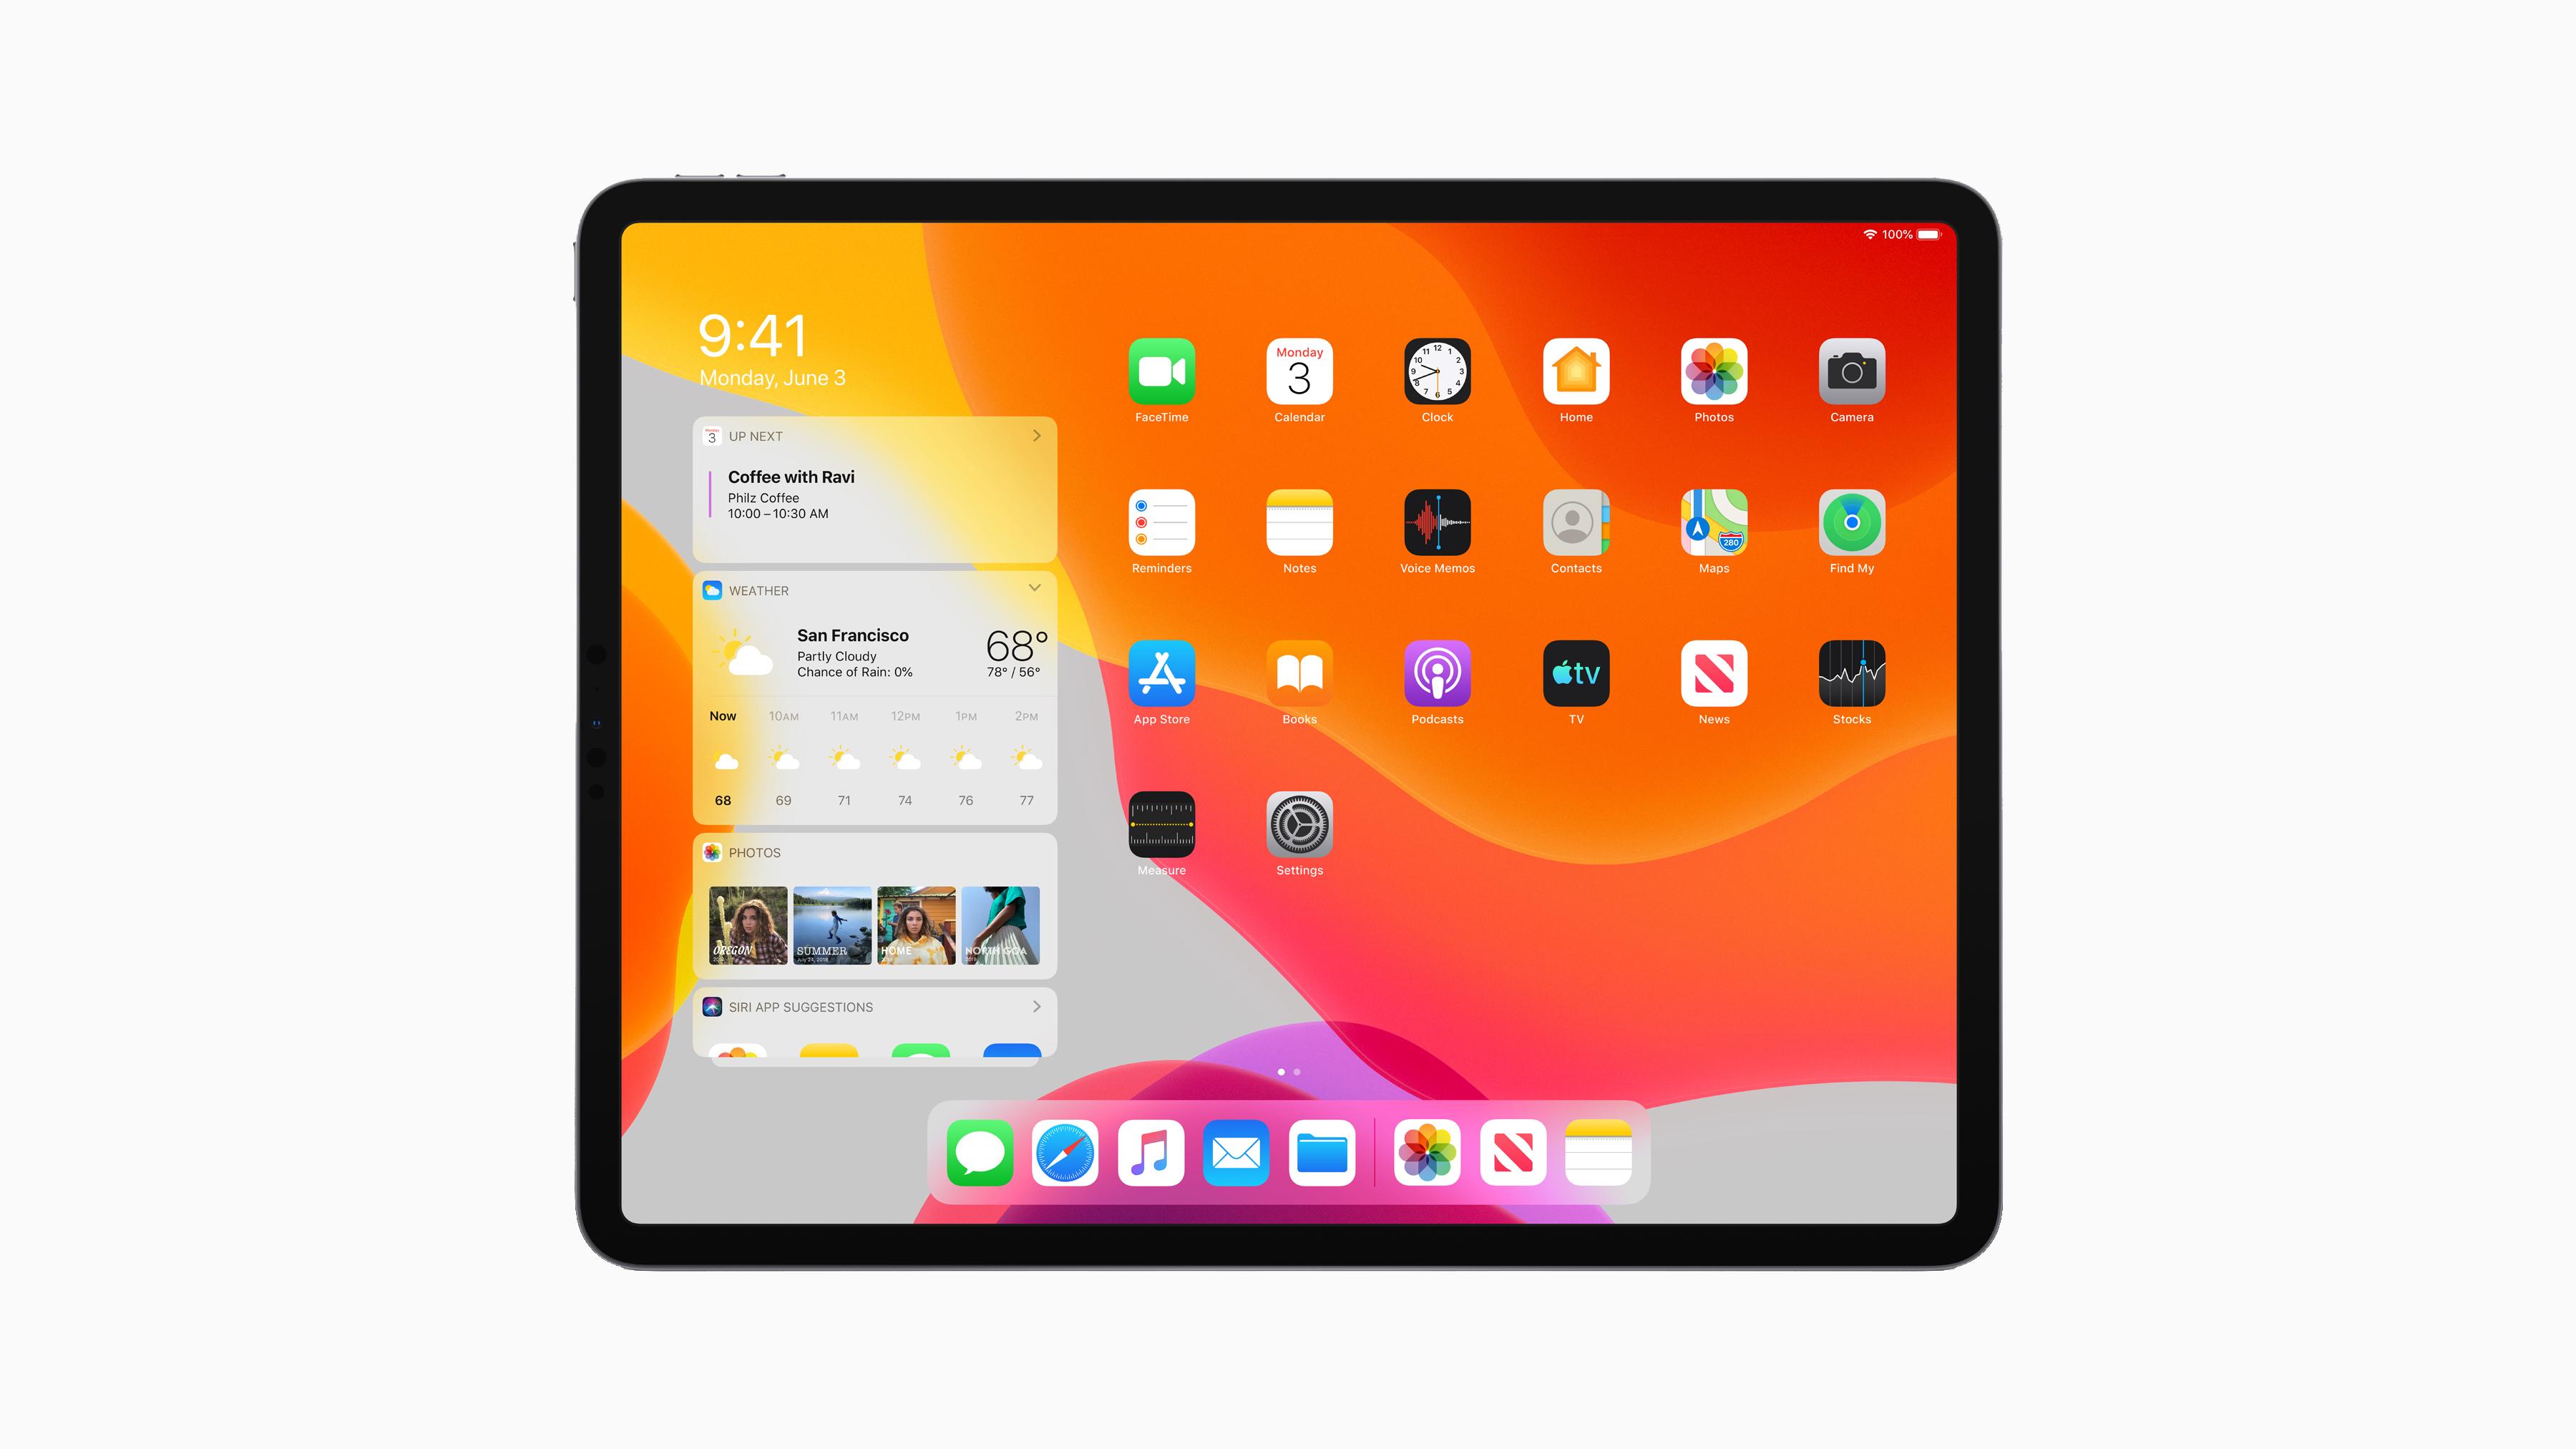 The iPad Pro running iPadOS.